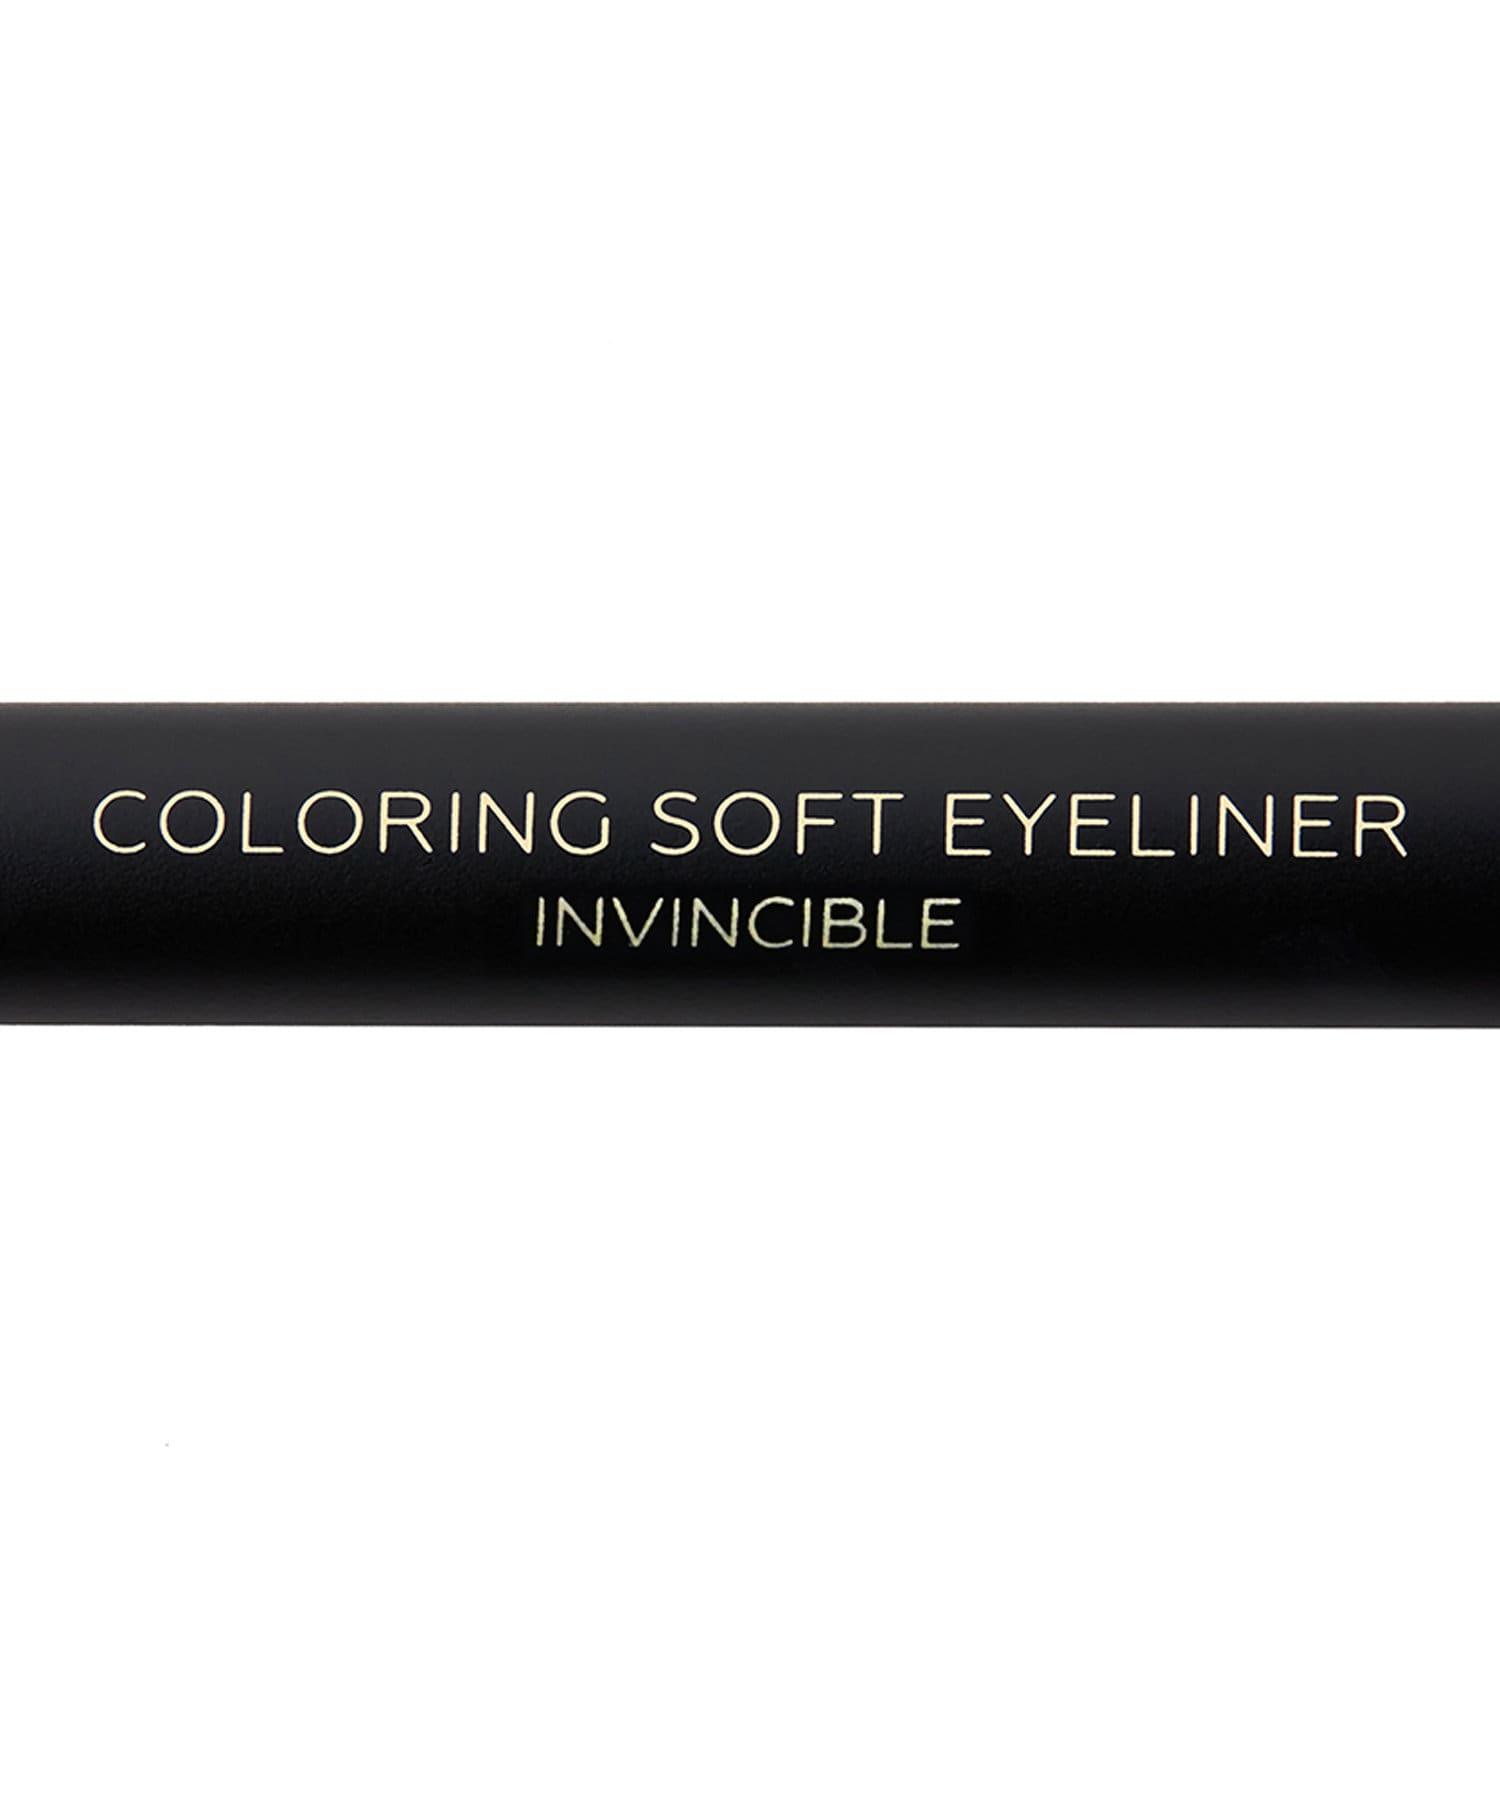 mystic(ミスティック) uneven coloring soft eyeliner